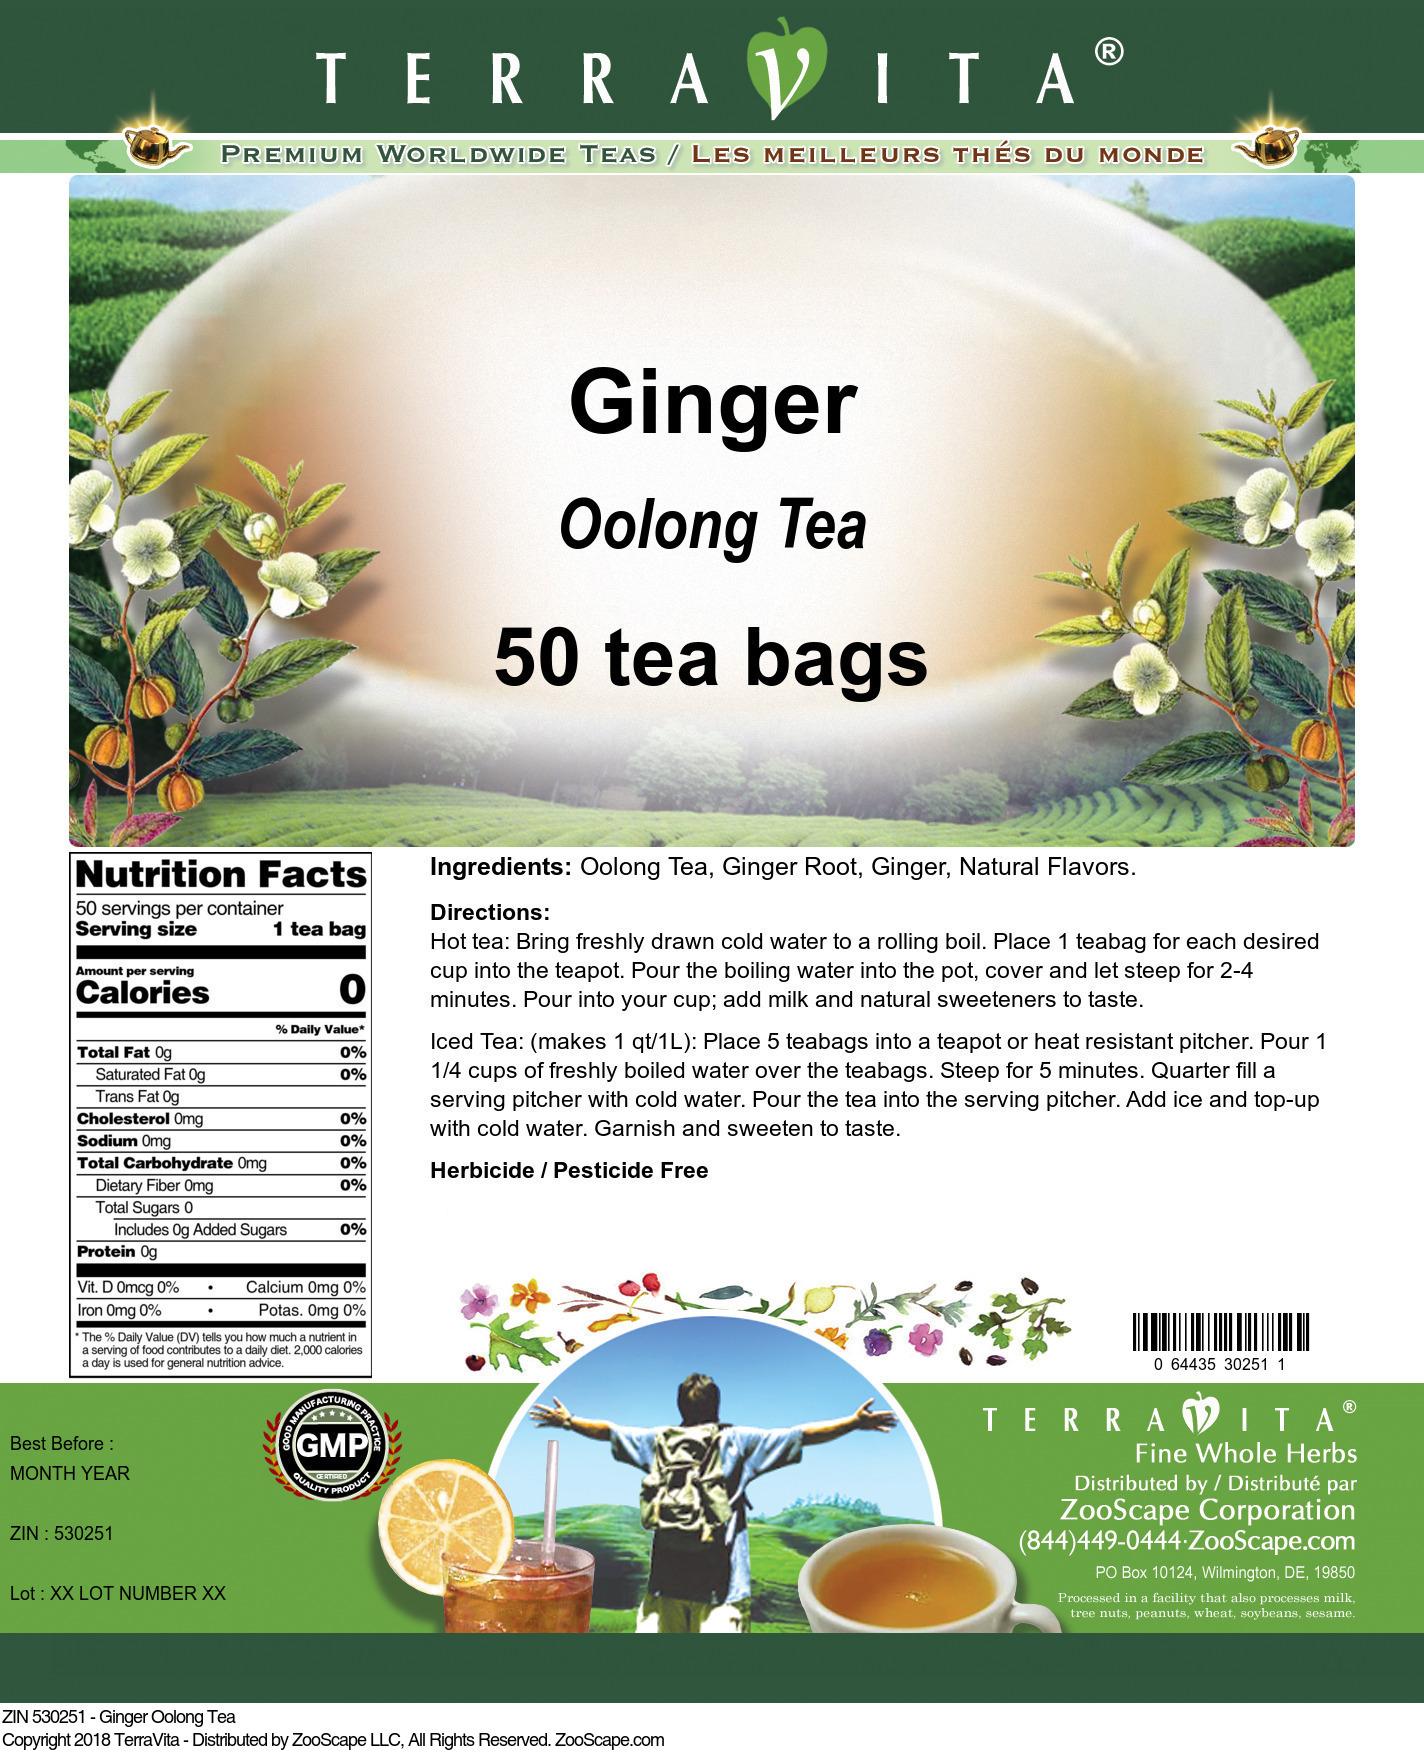 Ginger Oolong Tea